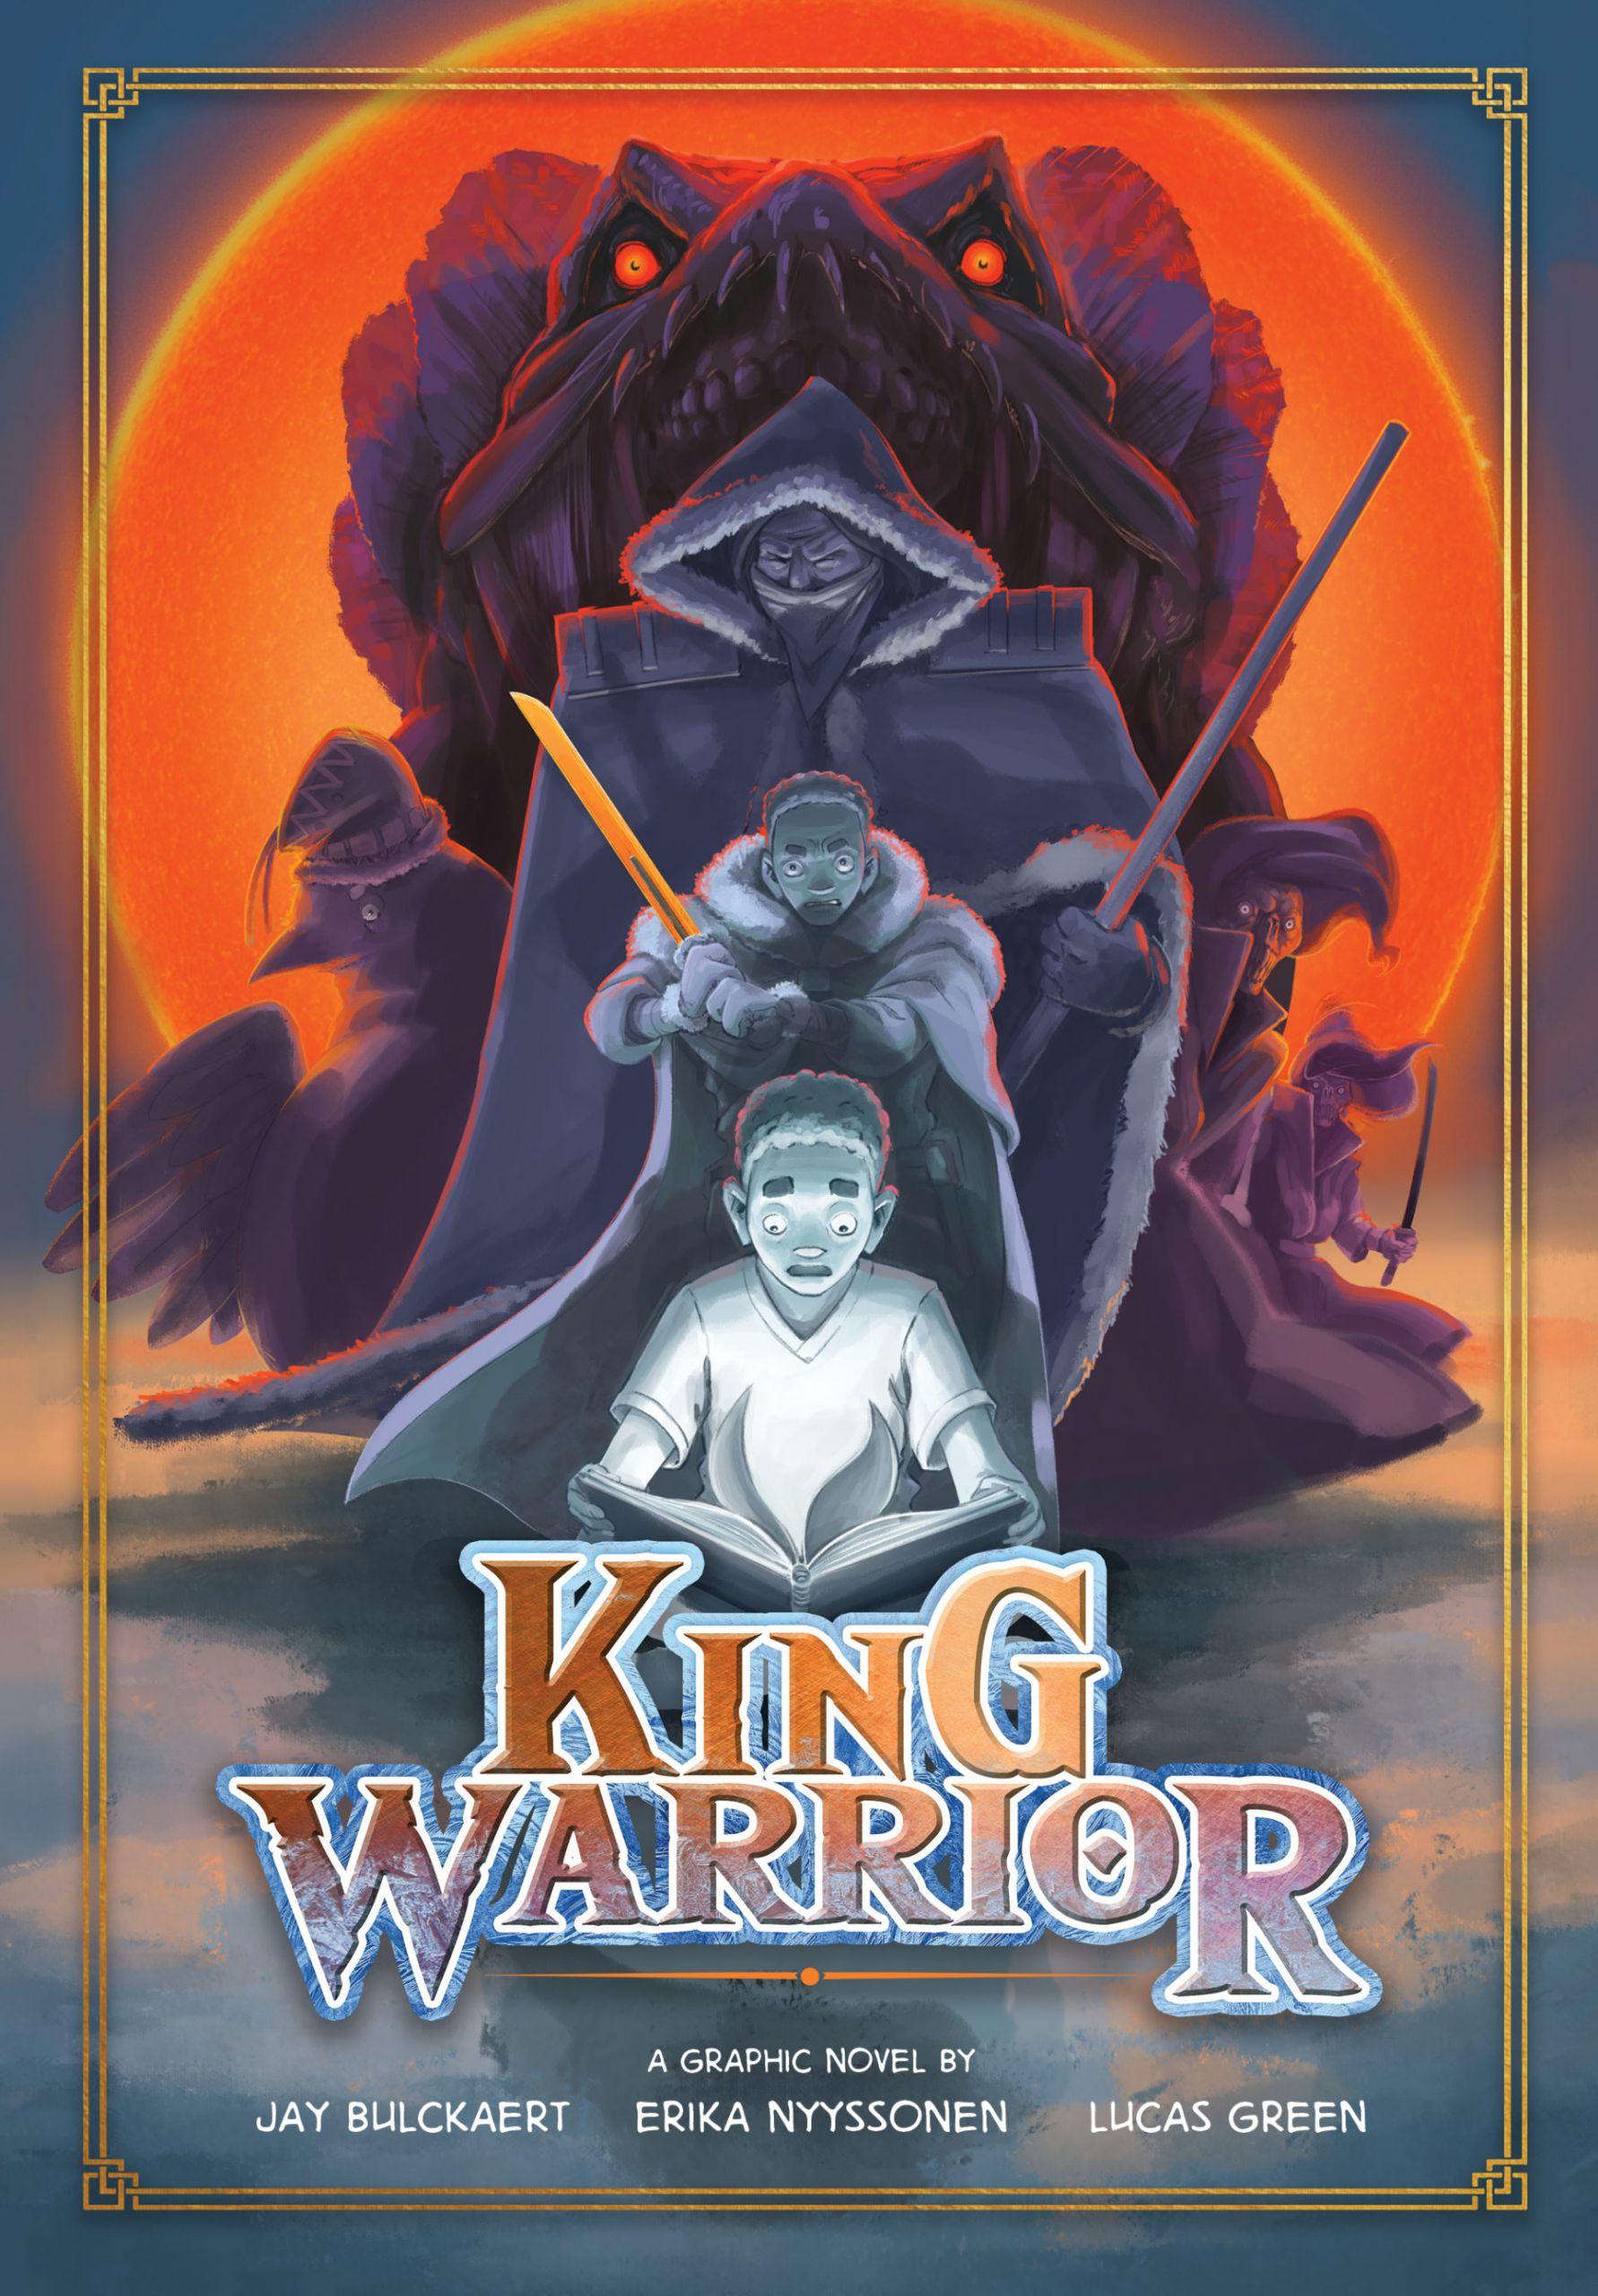 King Warrior Poster